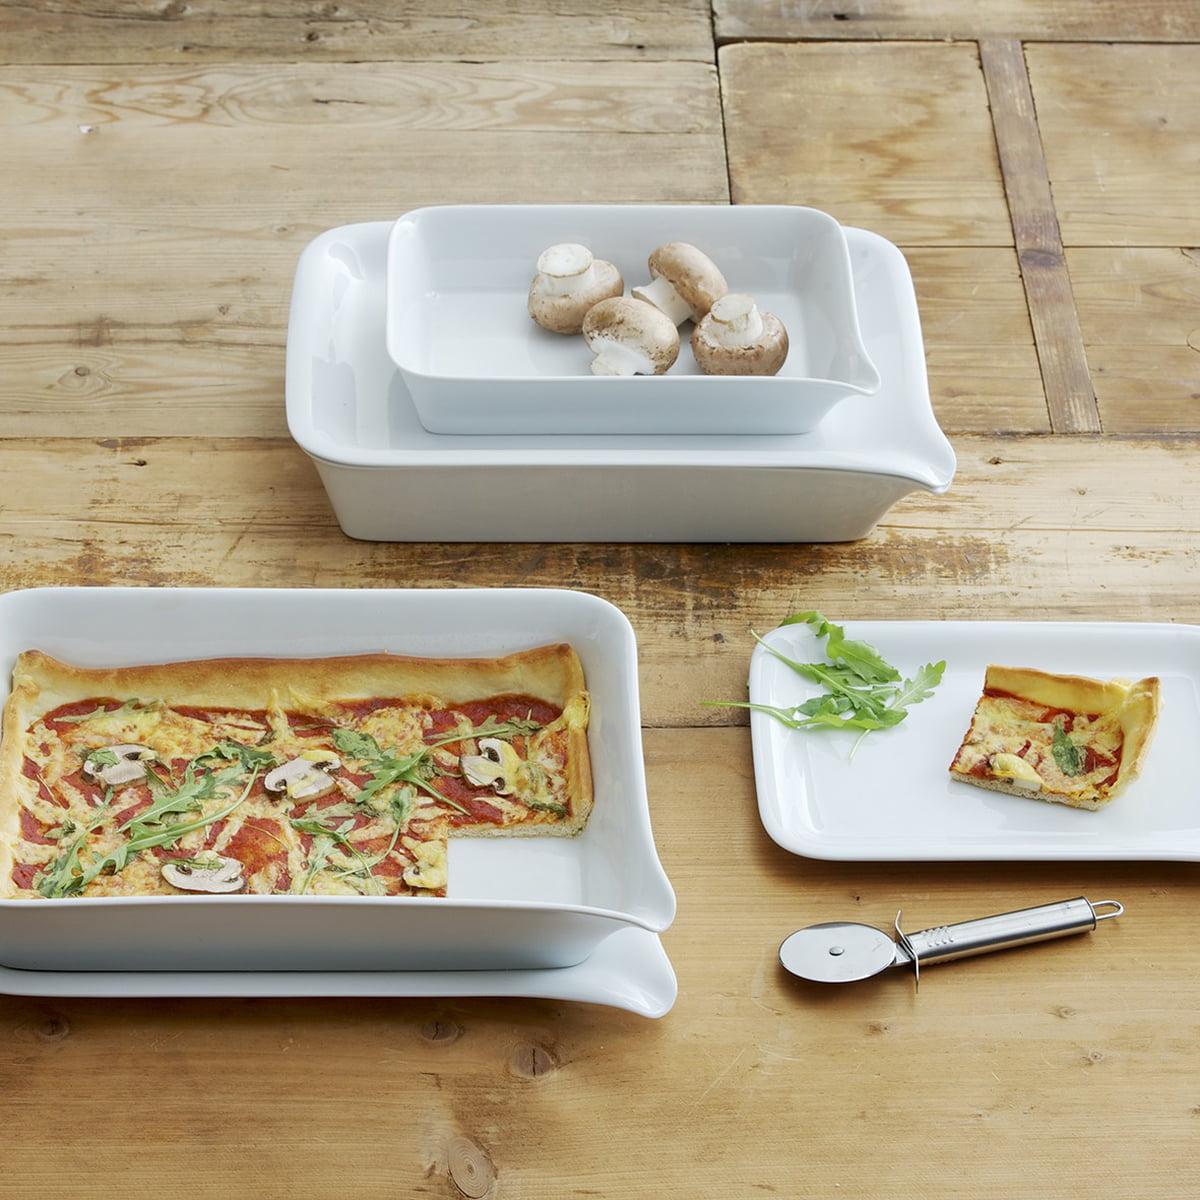 kahla magic grip baking dish and menu plate - kahla  magic grip baking dish and menu plate